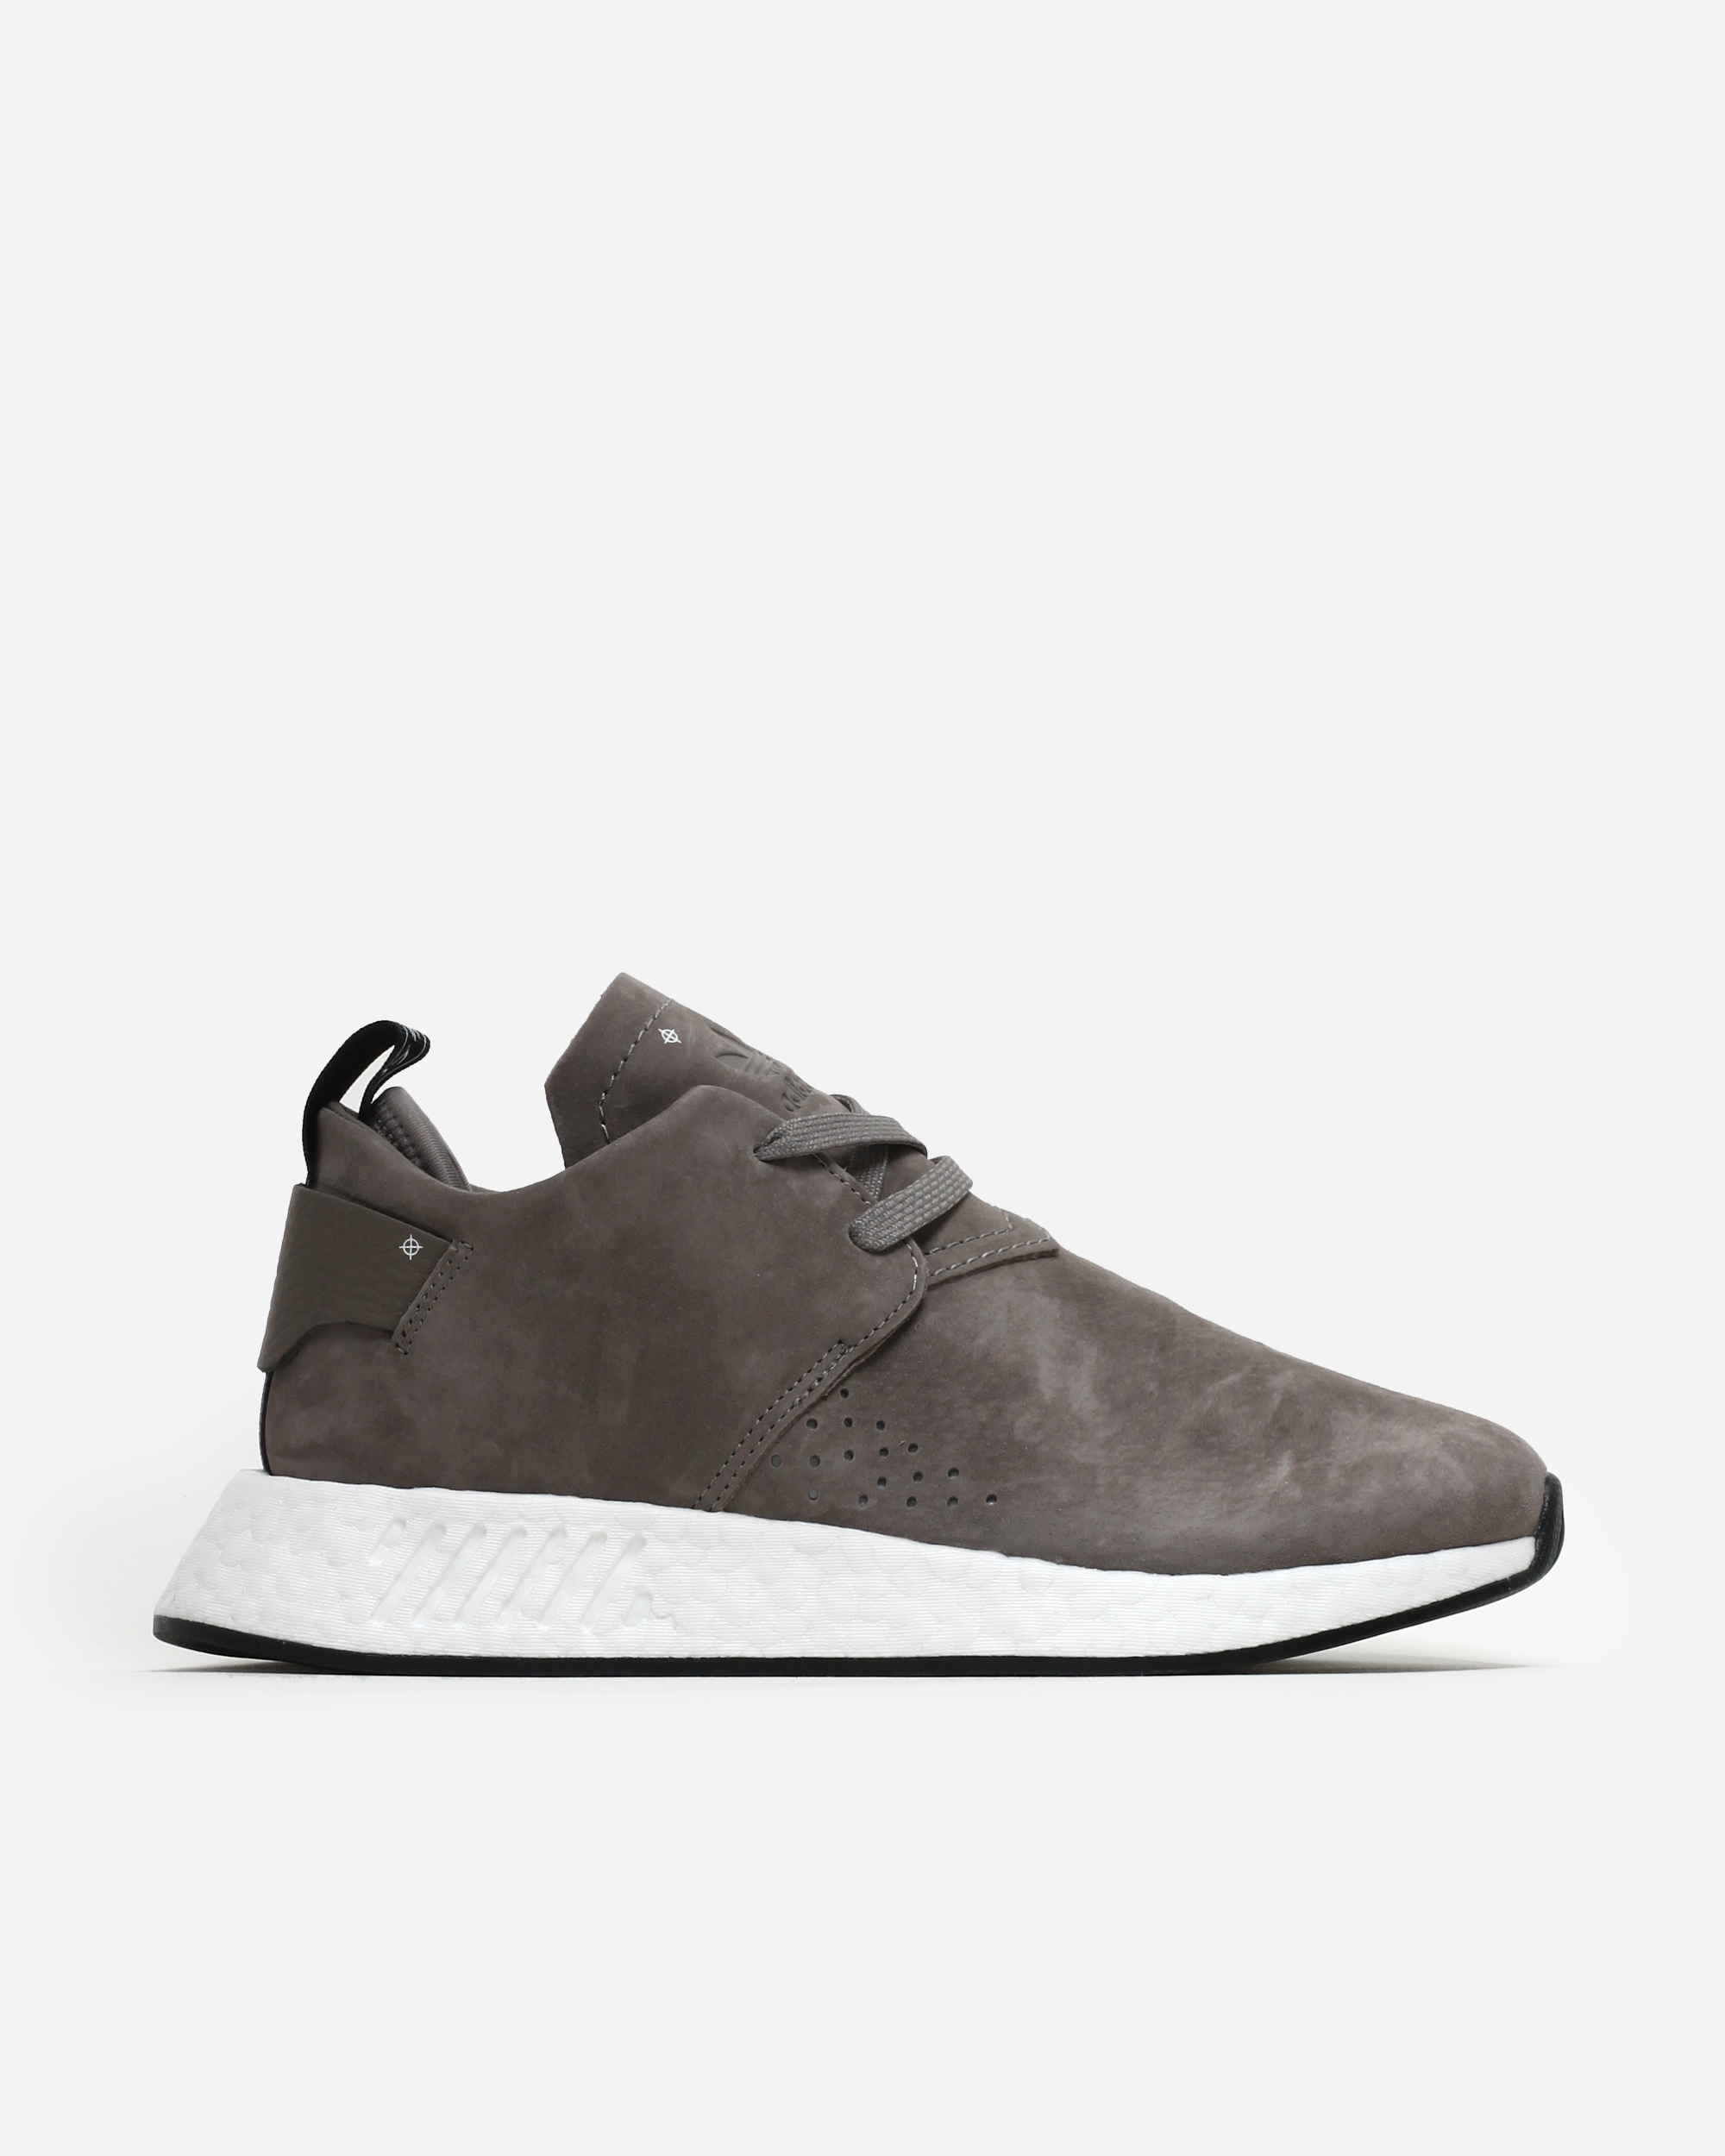 NEU adidas Originals NMD_C2 Boost Sneaker BY9913 günstig